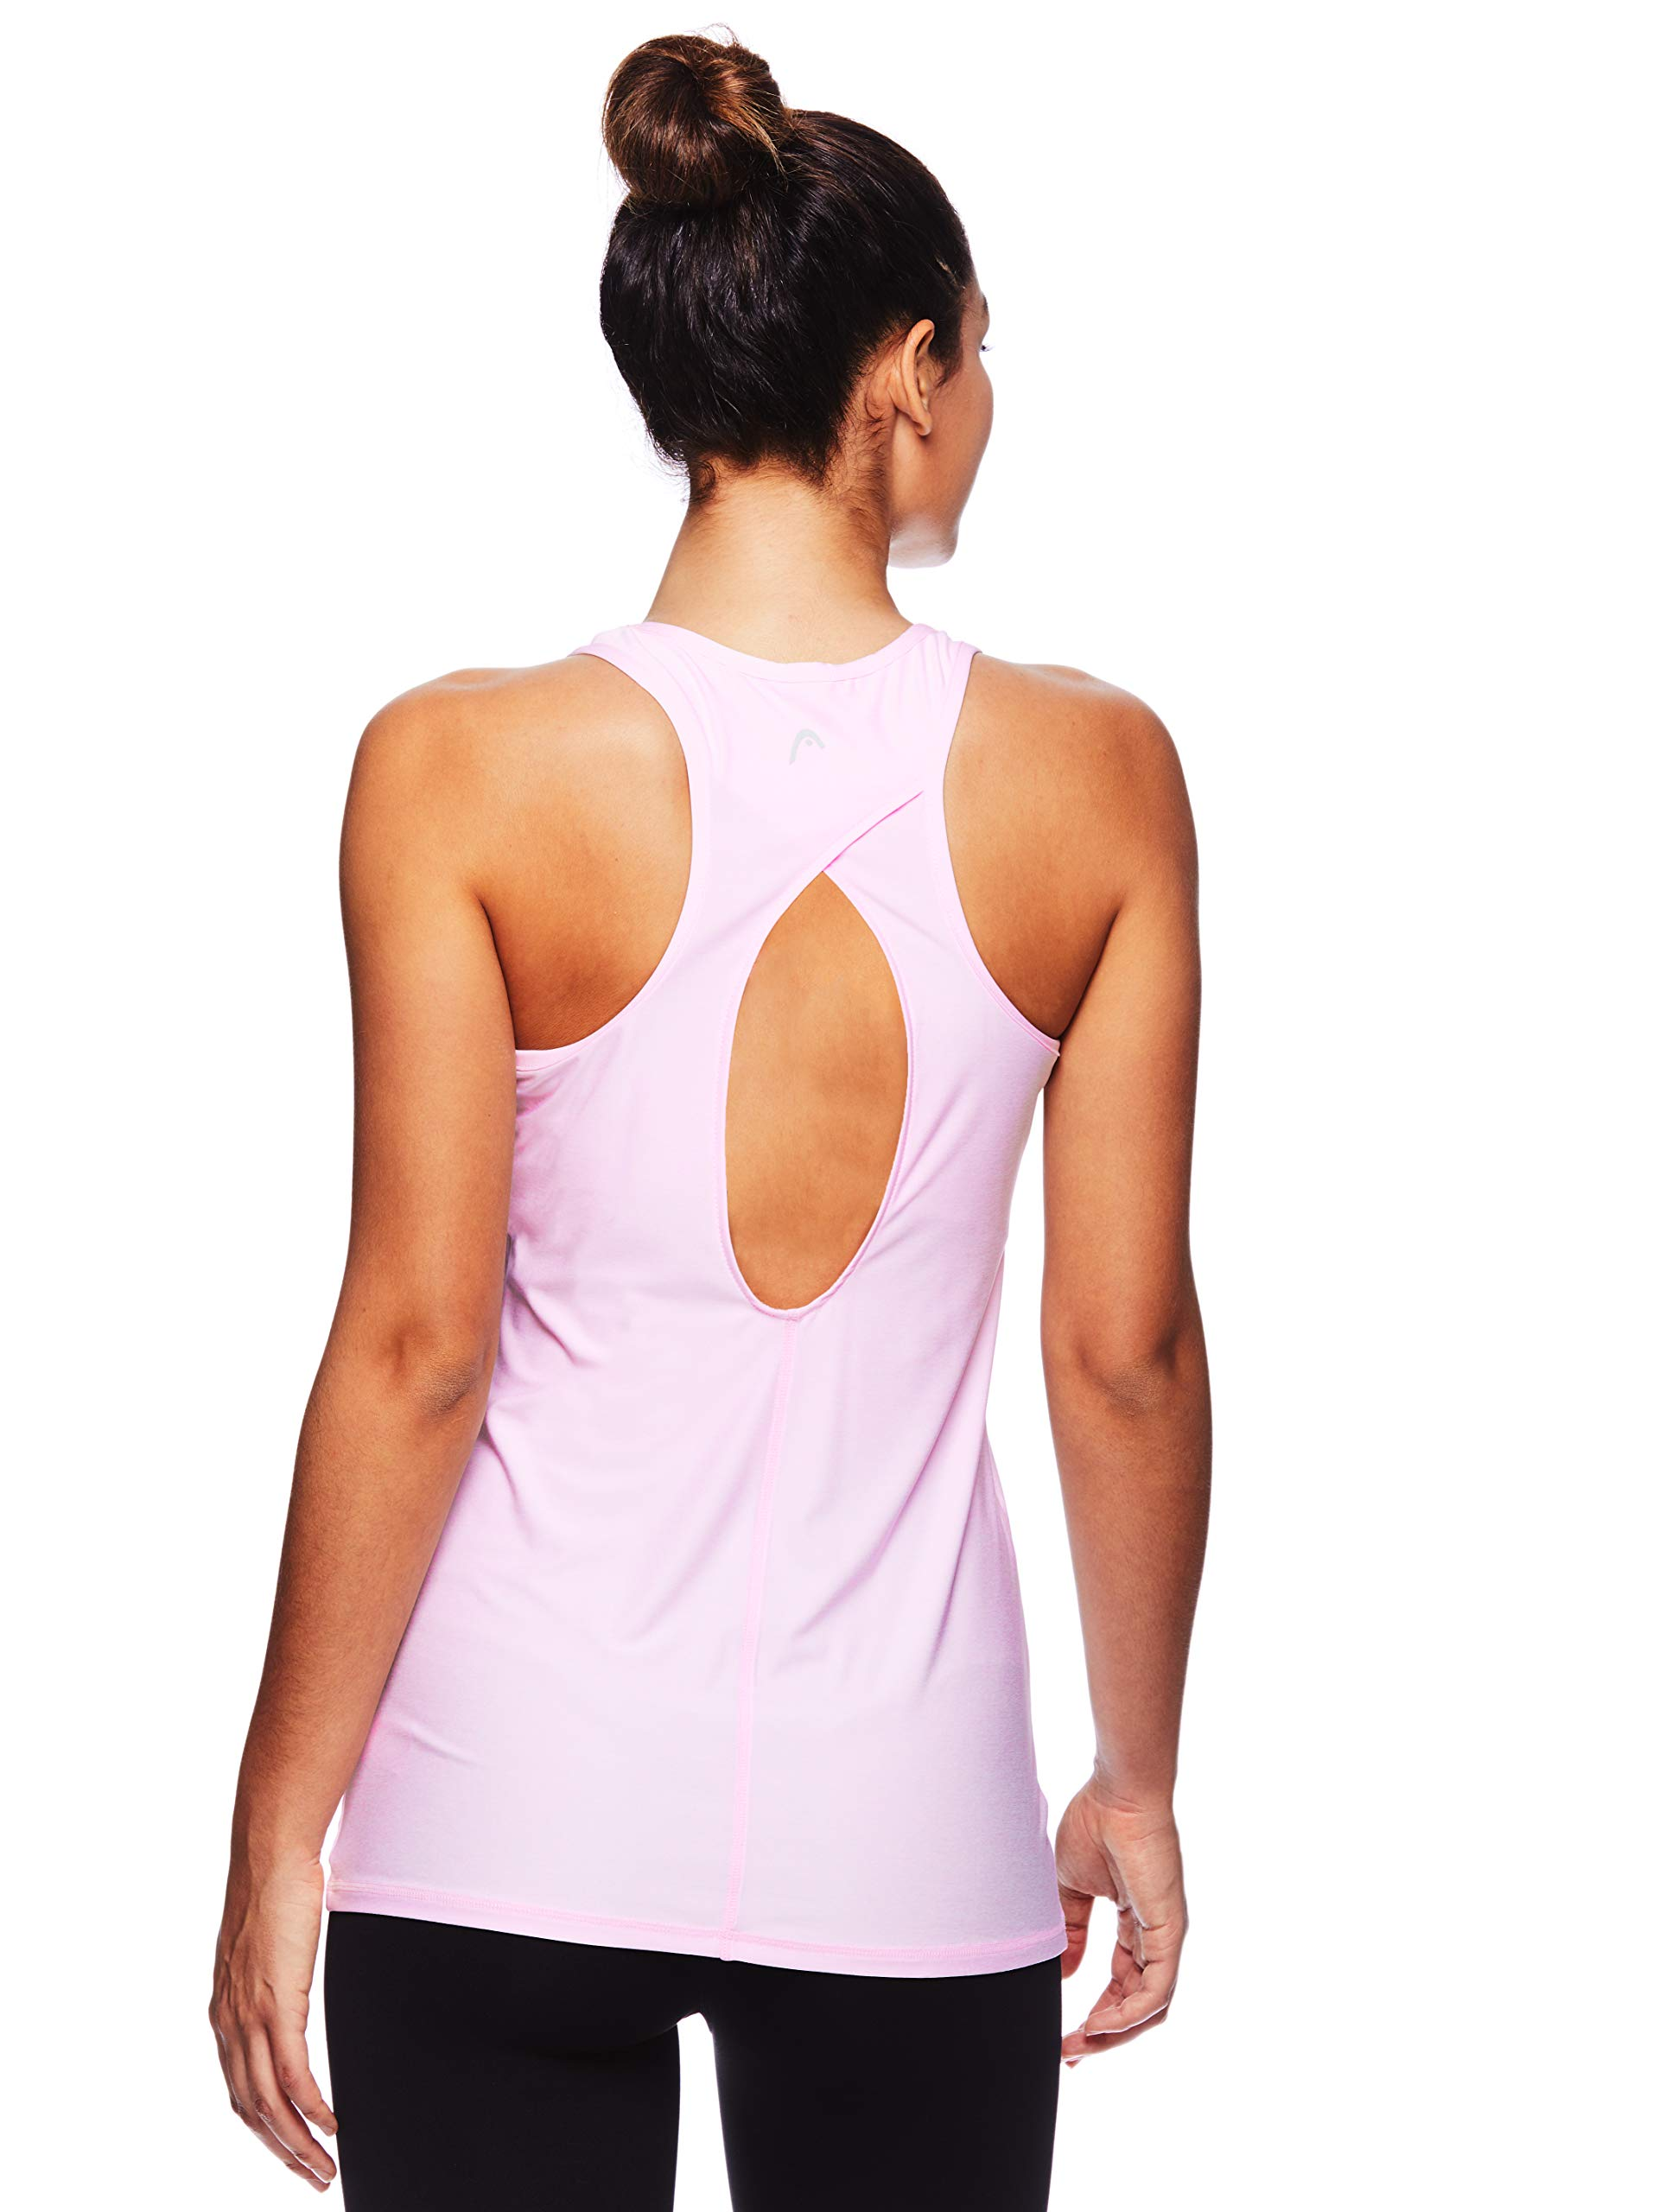 HEAD Women's Match Up Racerback Tank Top - Sleeveless Flowy Performance Activewear Shirt - Cherry Blossom Heather Match Up Tank, X-Small